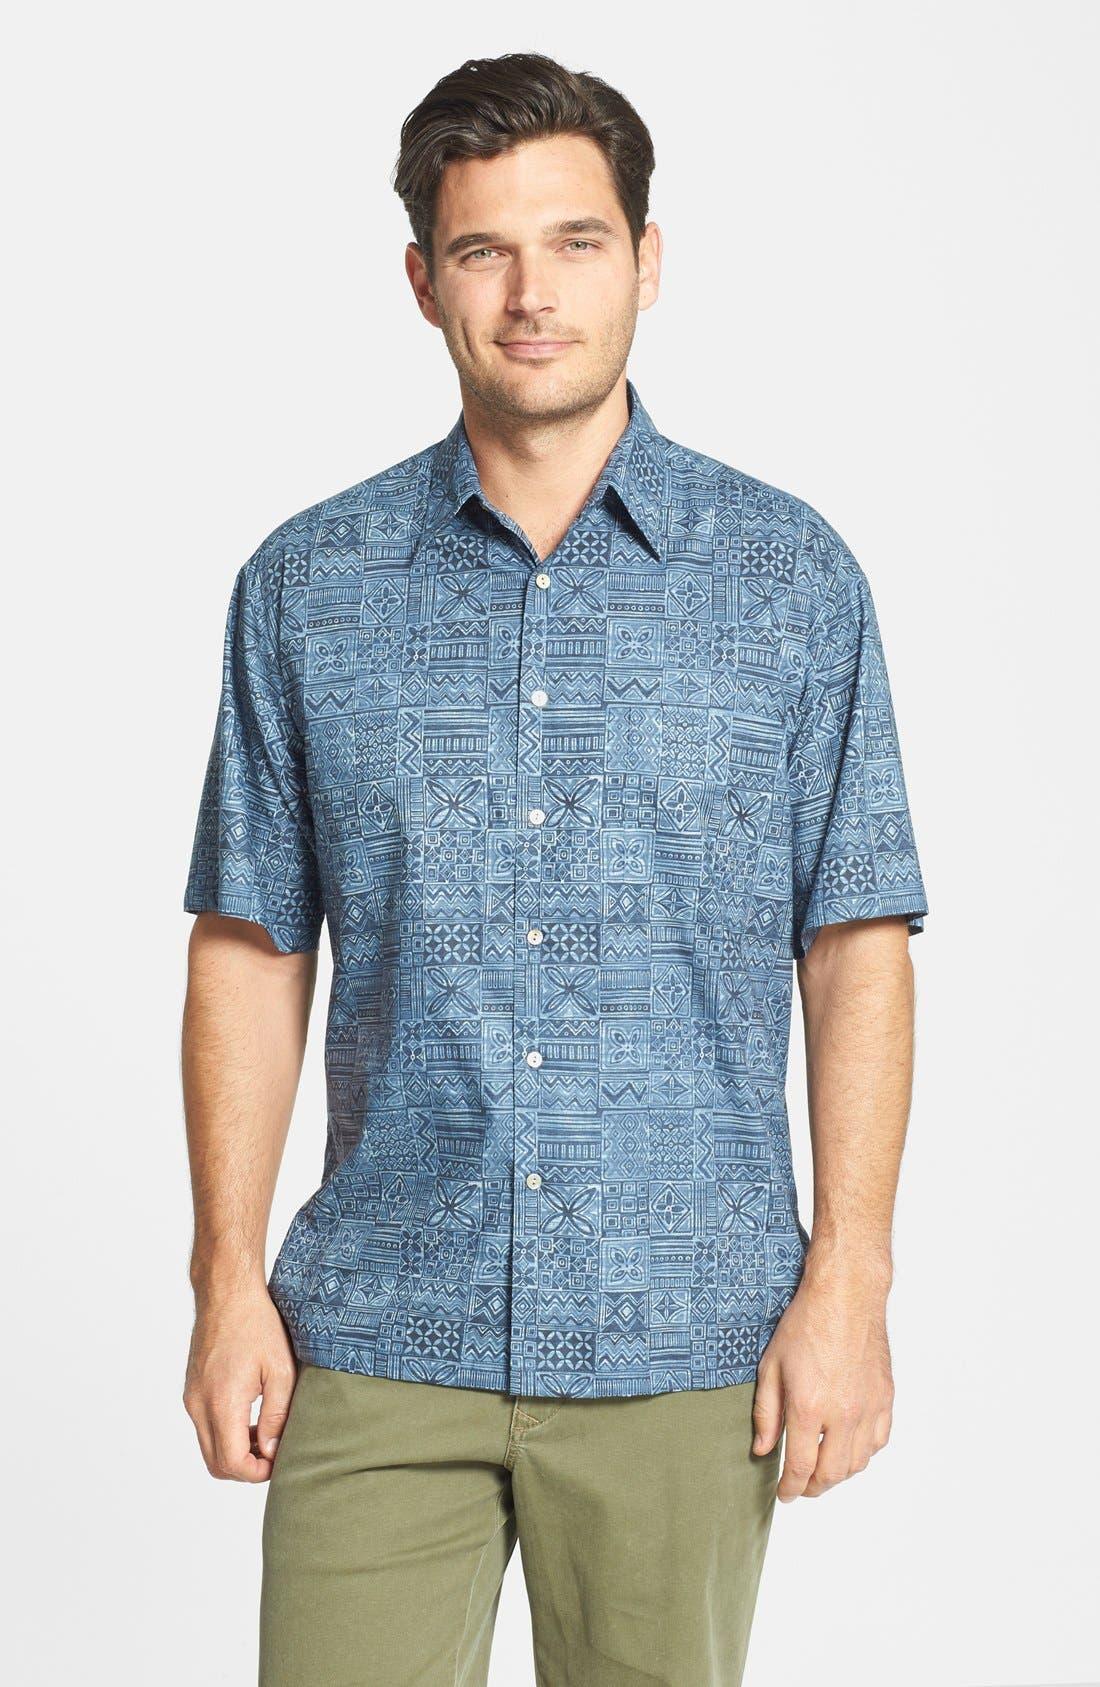 Alternate Image 1 Selected - Tori Richard 'Tapa Maze' Cotton Lawn Campshirt